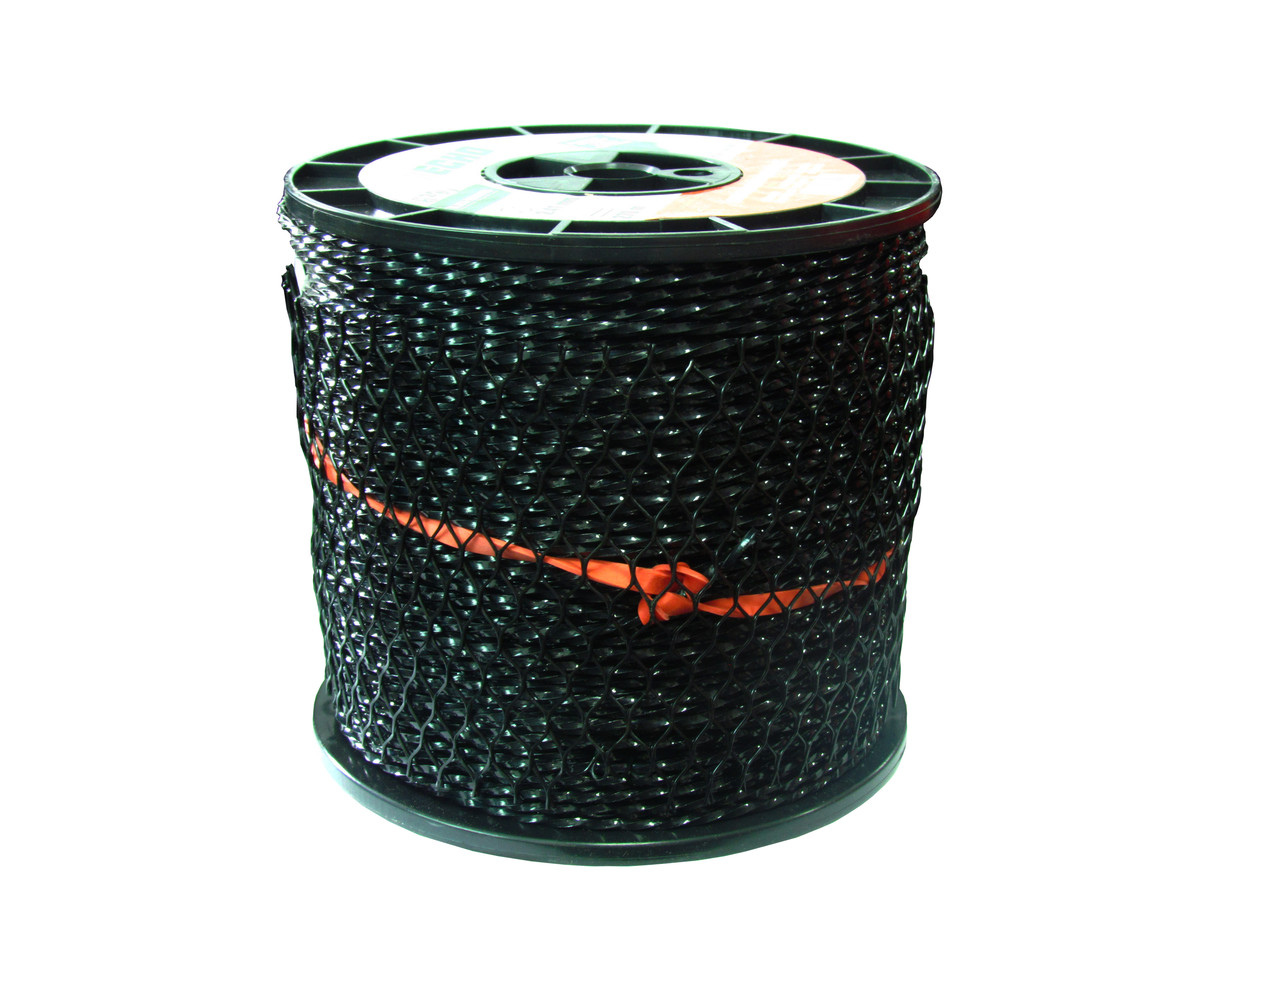 Струна косильная ECHO Black Diamond 2,7 мм 216 м спиральная